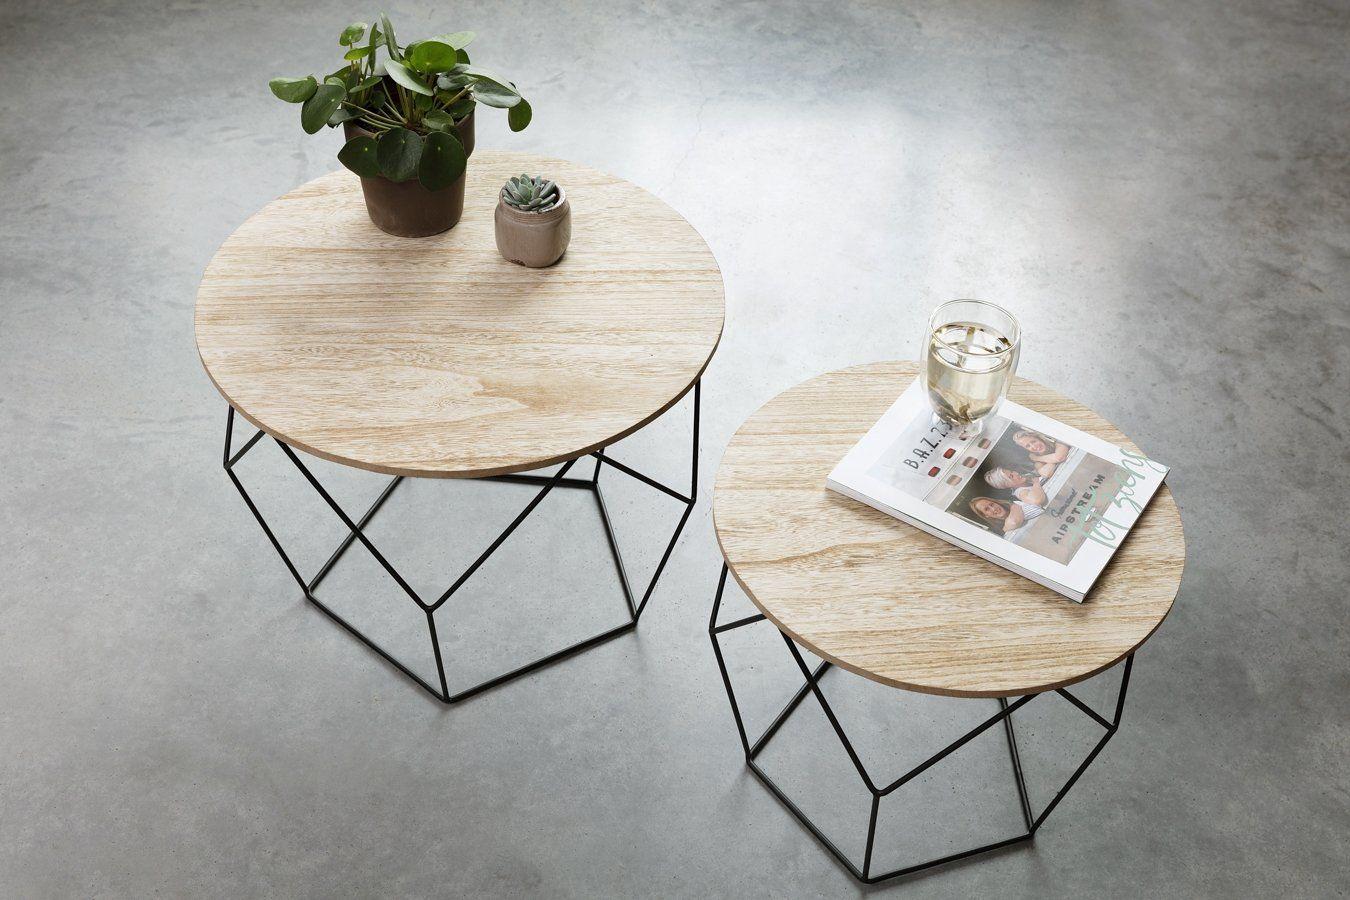 Lifa Living Beistelltisch Schwarzes Metall Holzplatte Runder